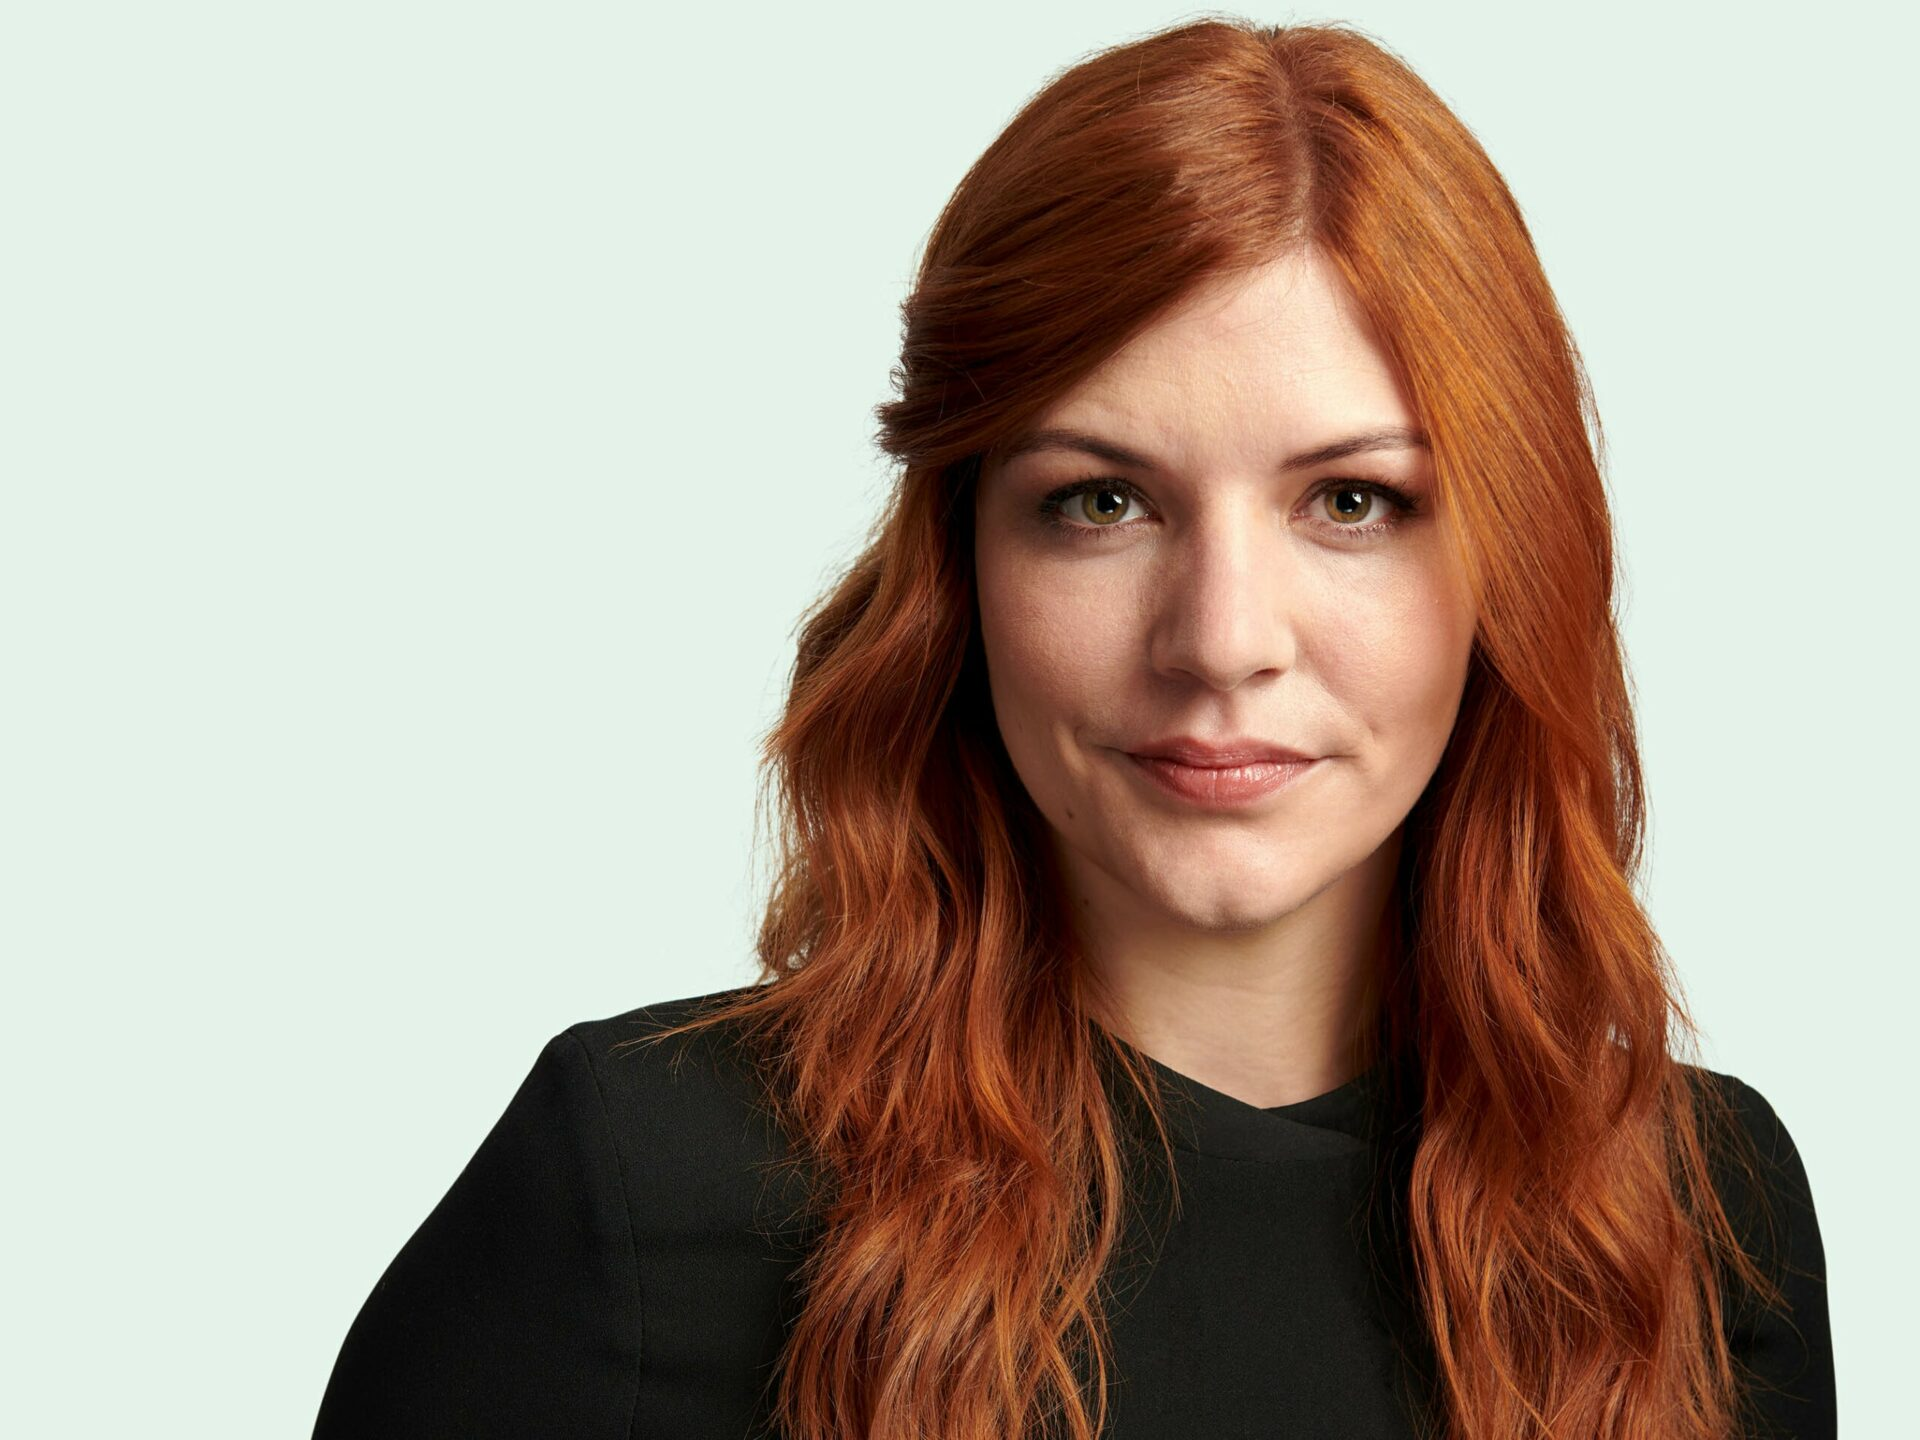 Hannah Sophie Lupper